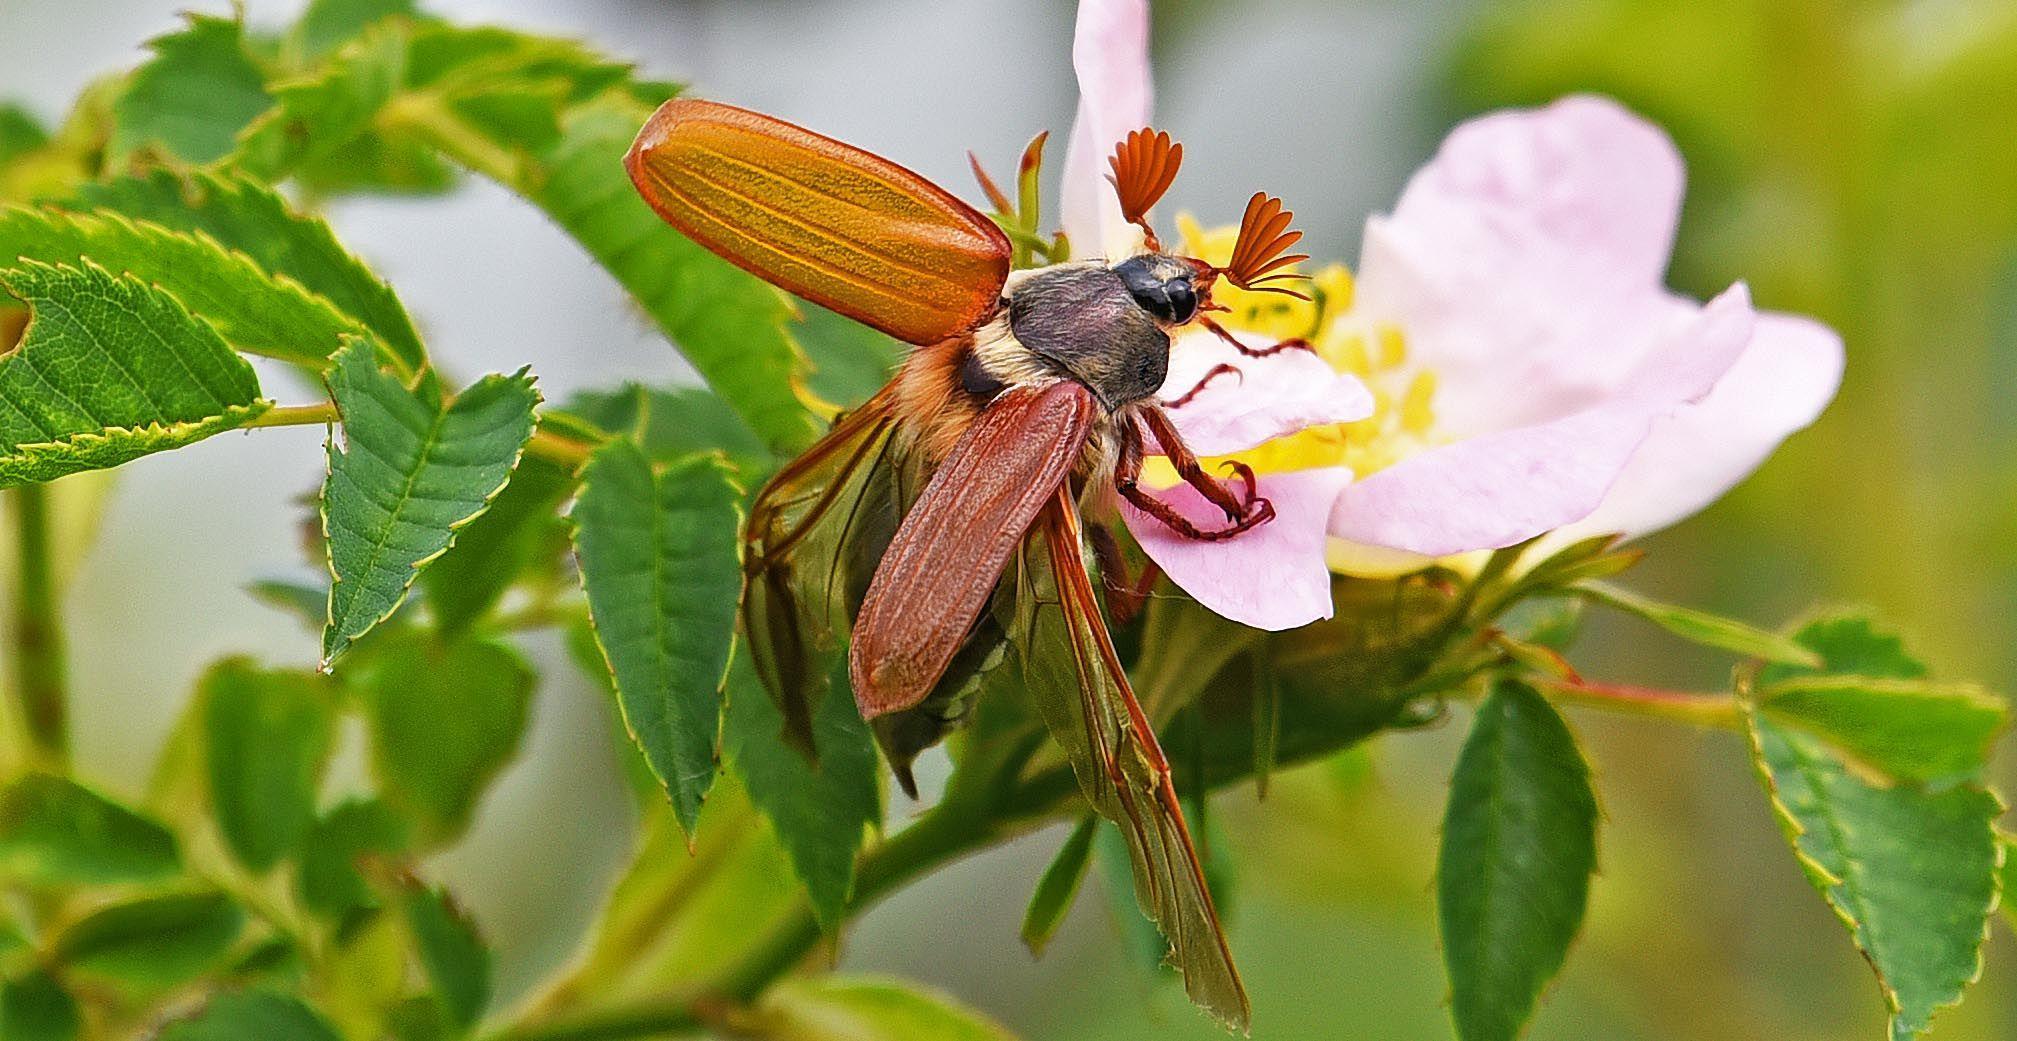 De meikevers en hun niet-poepende enge larven | column Geeke Remmelts